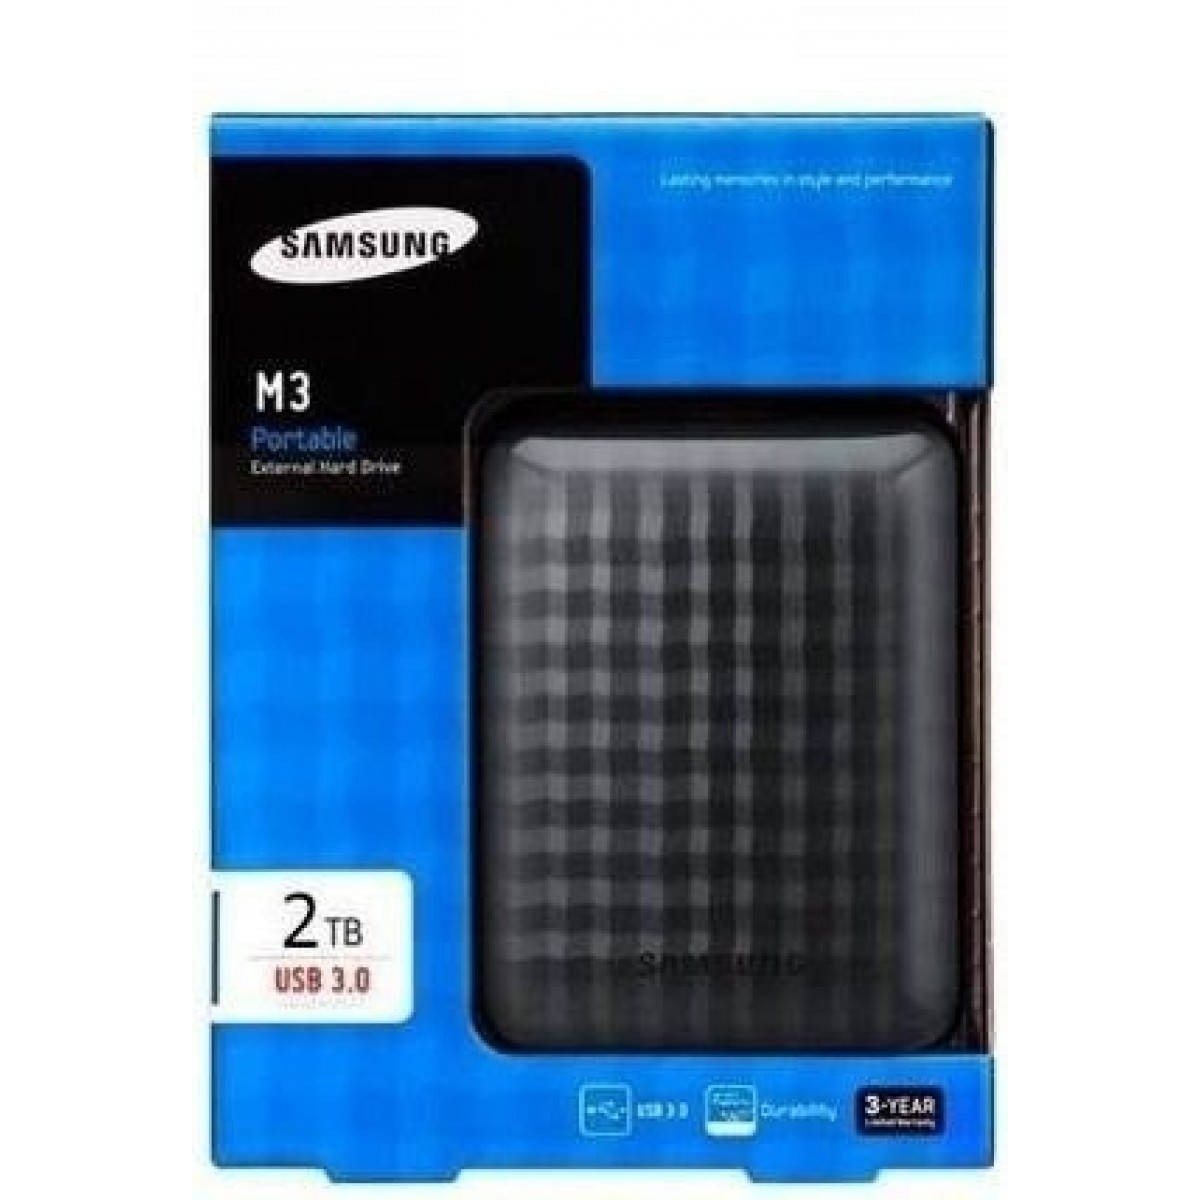 Samsung m3 2tb 2 5 portable external hard drive zi - Porta hard disk esterno 2 5 ...